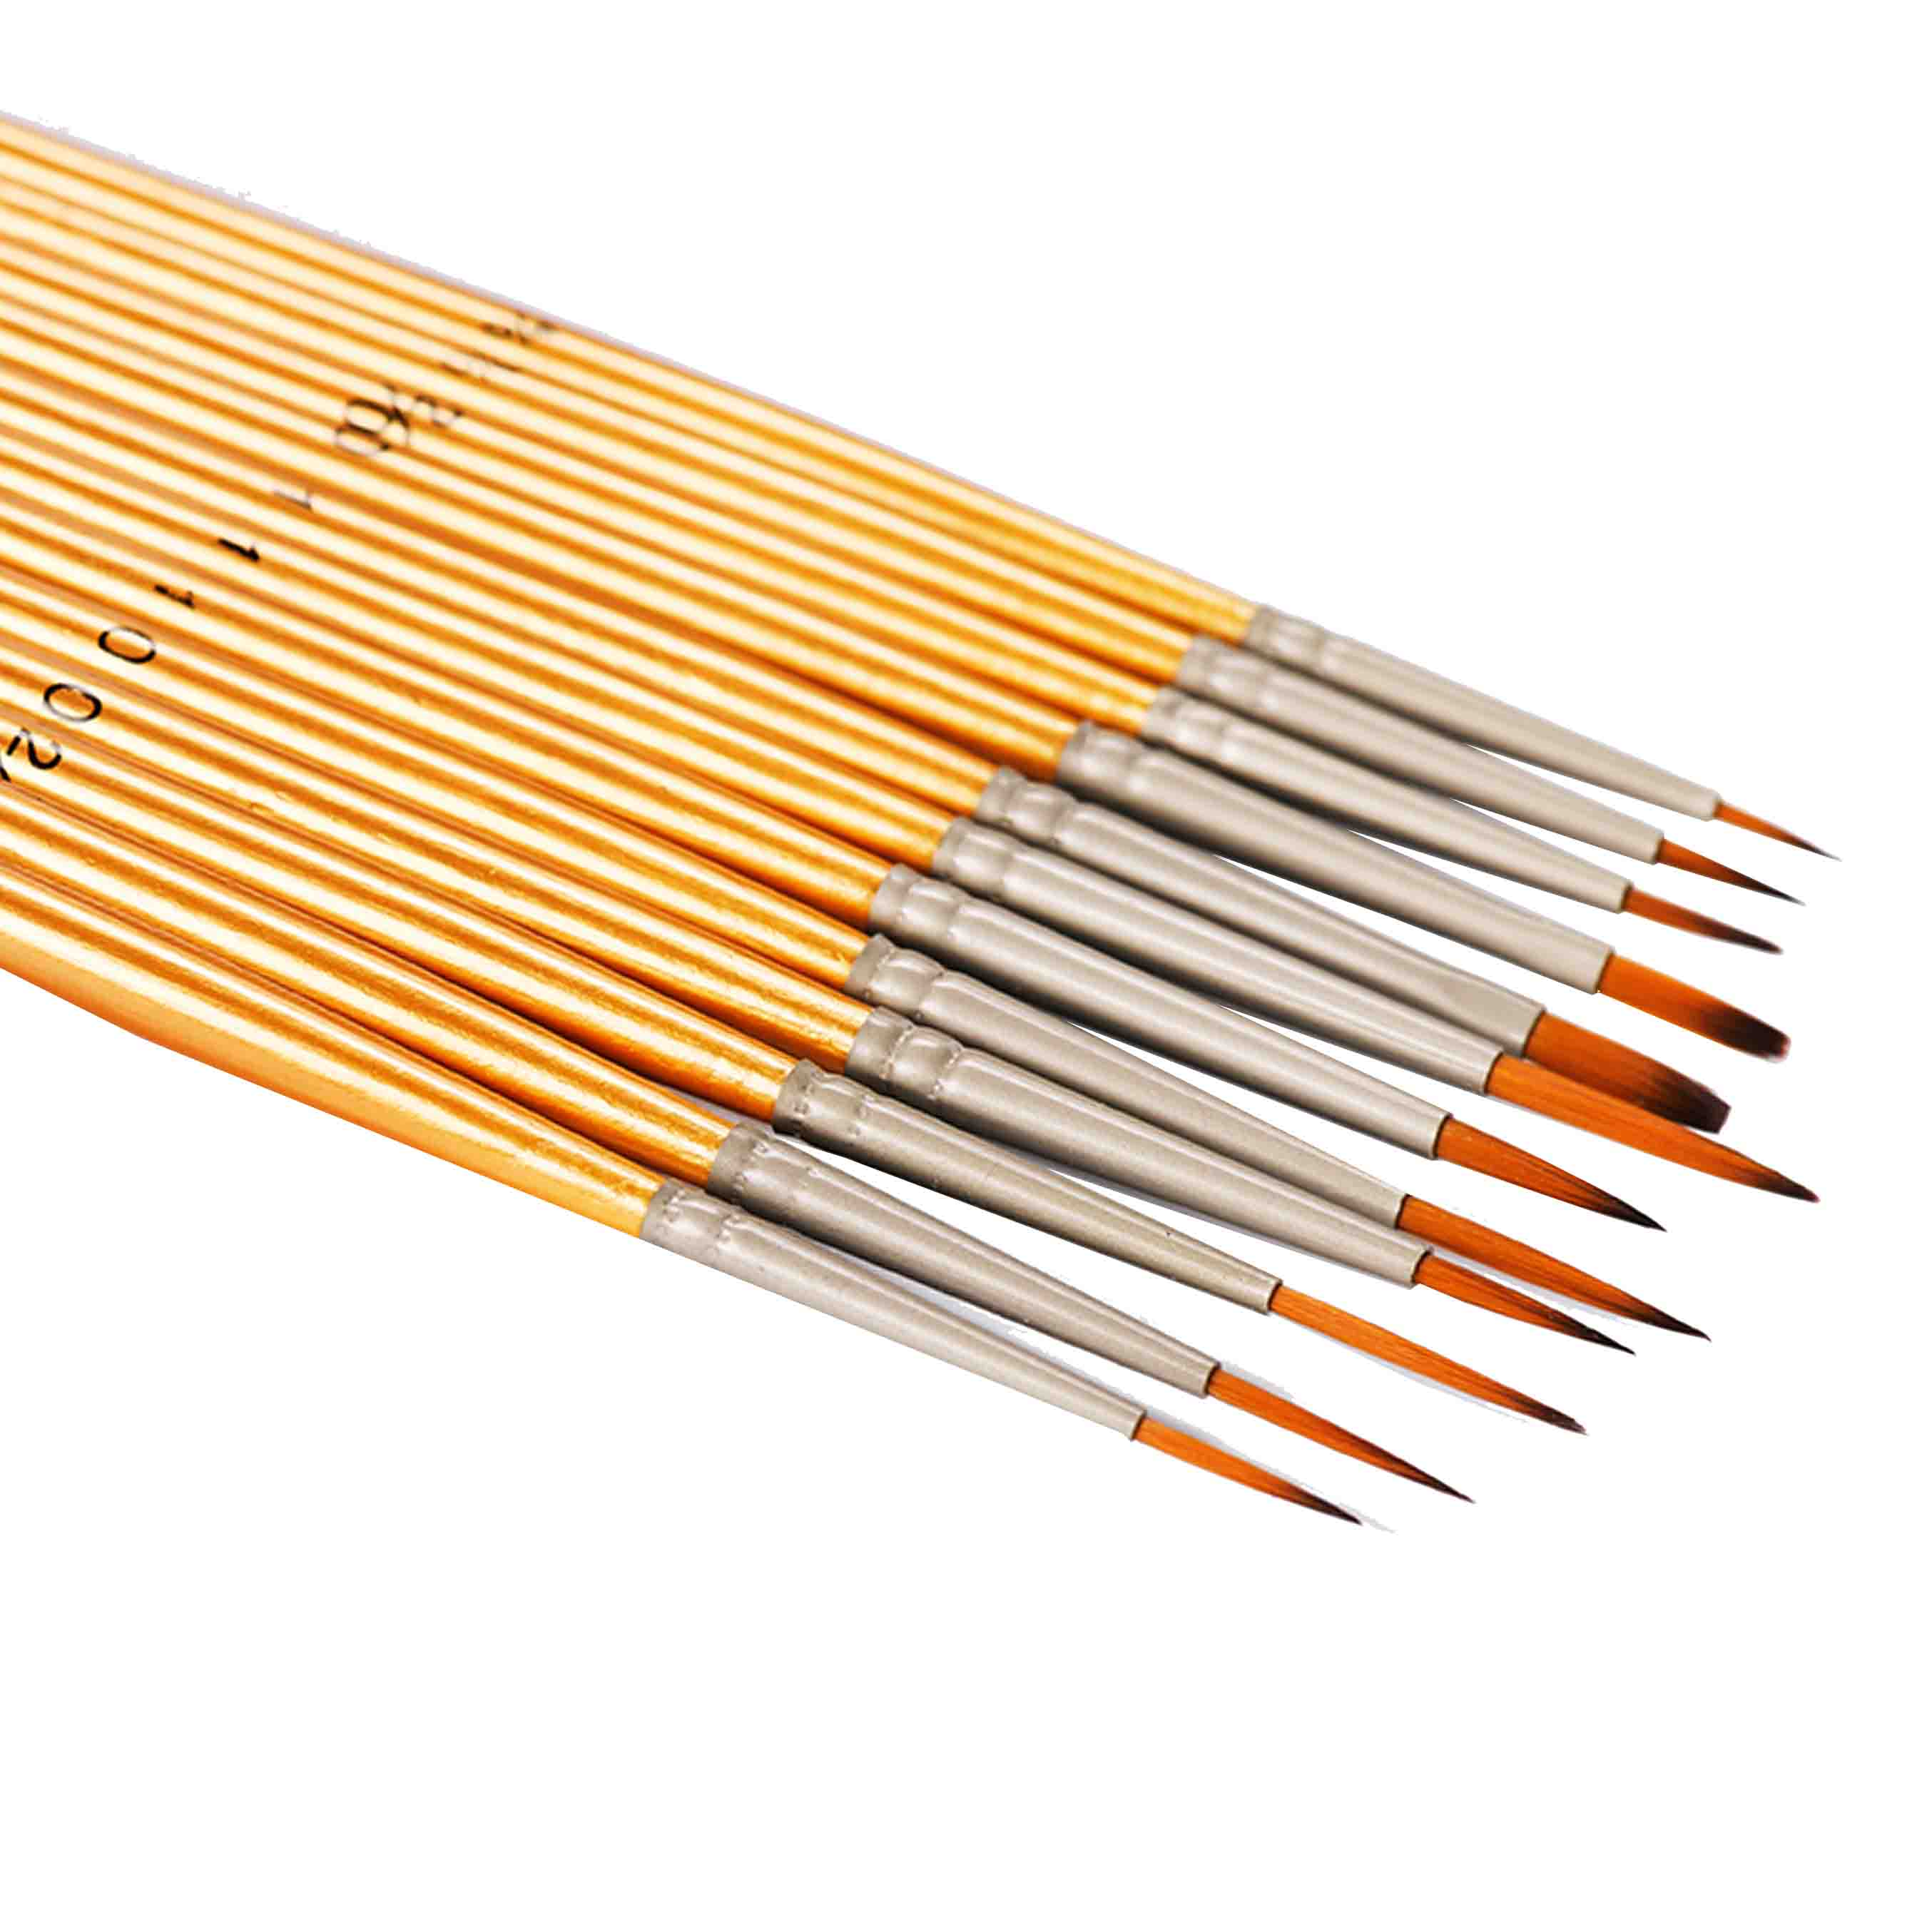 Miniature Brushes